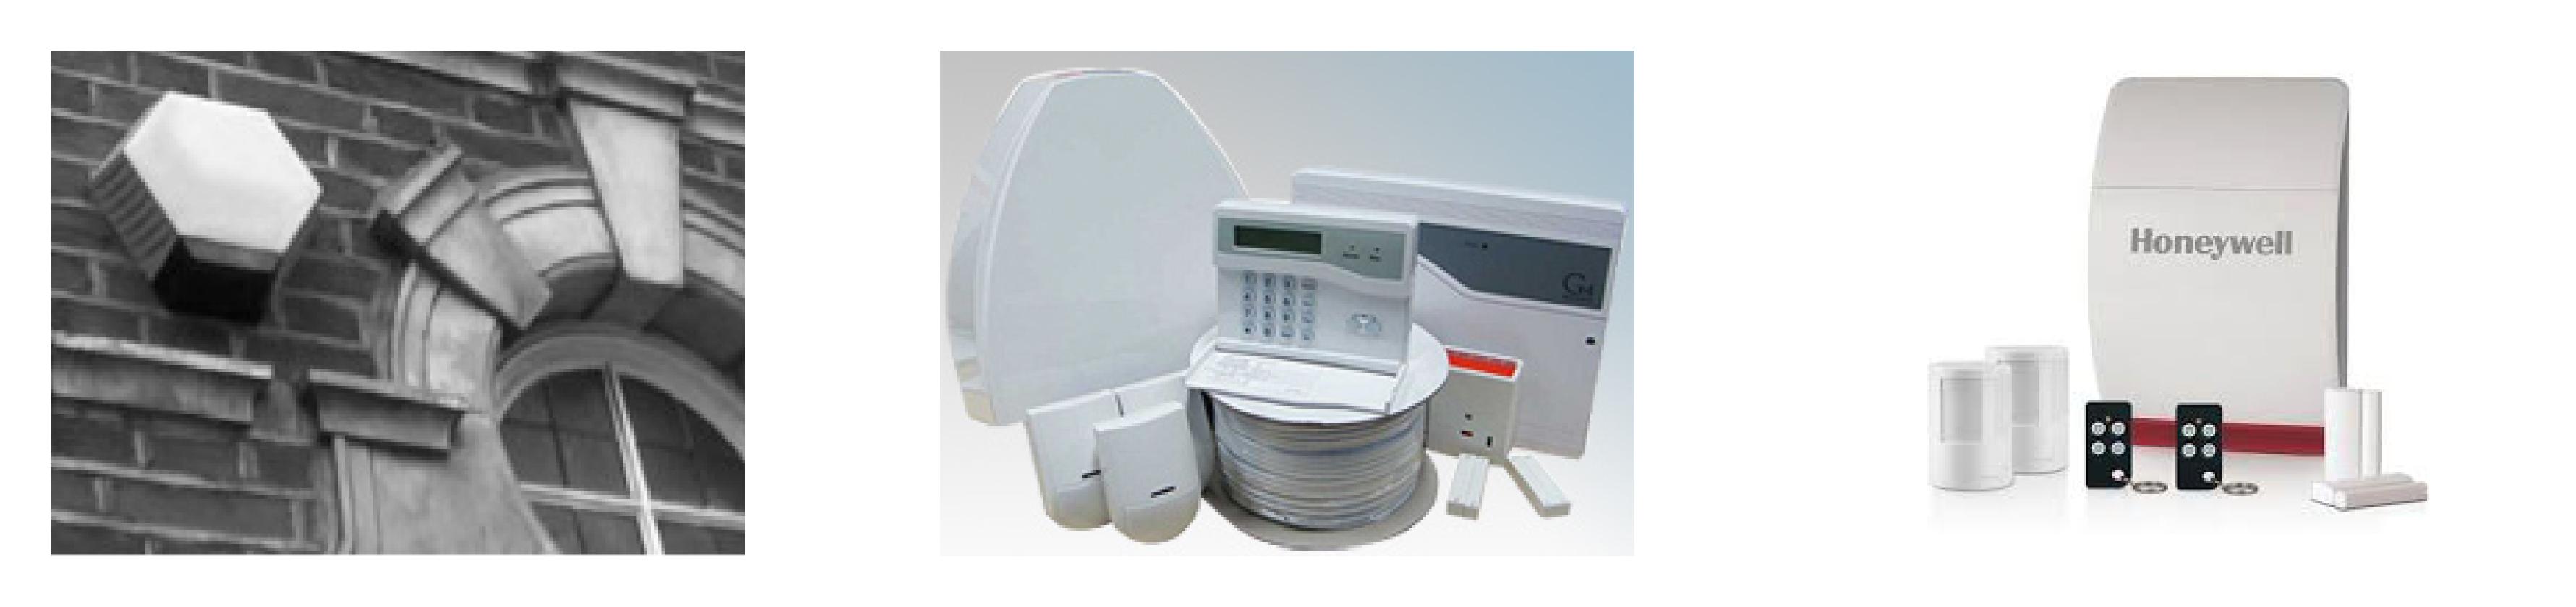 Intruder alarm installation in Cheltenham & Gloucester